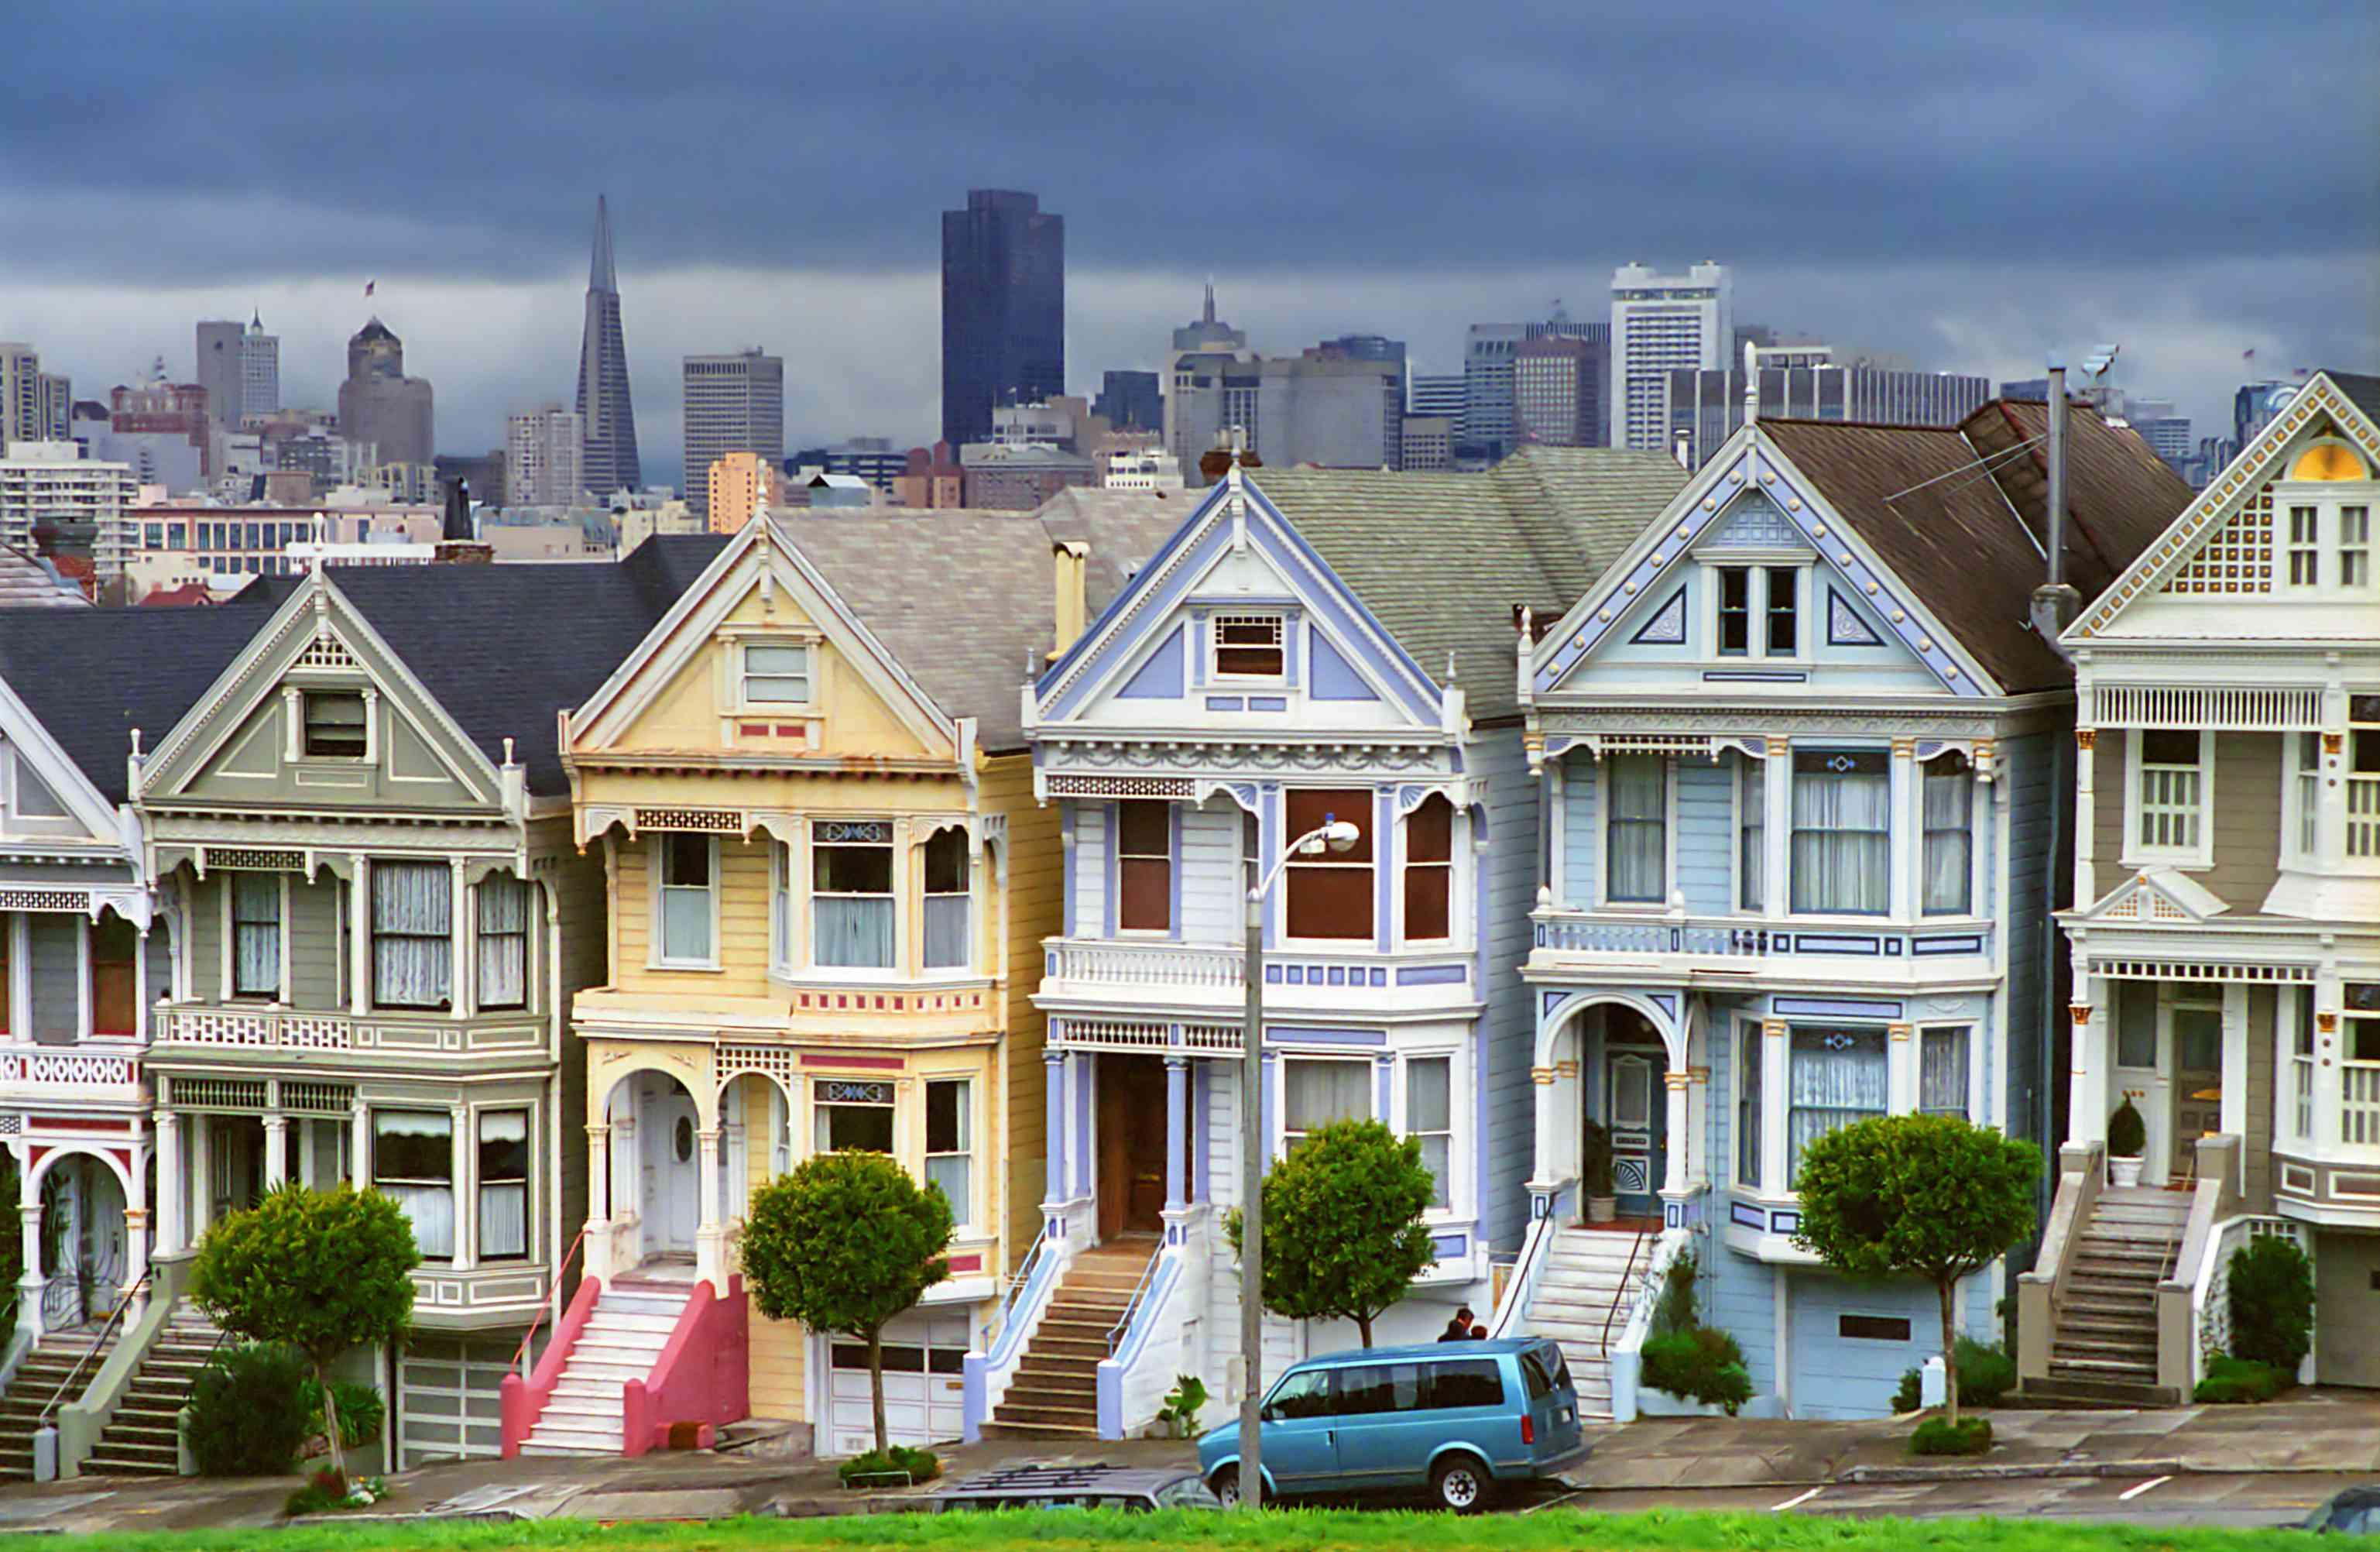 Painted ladies townhouses